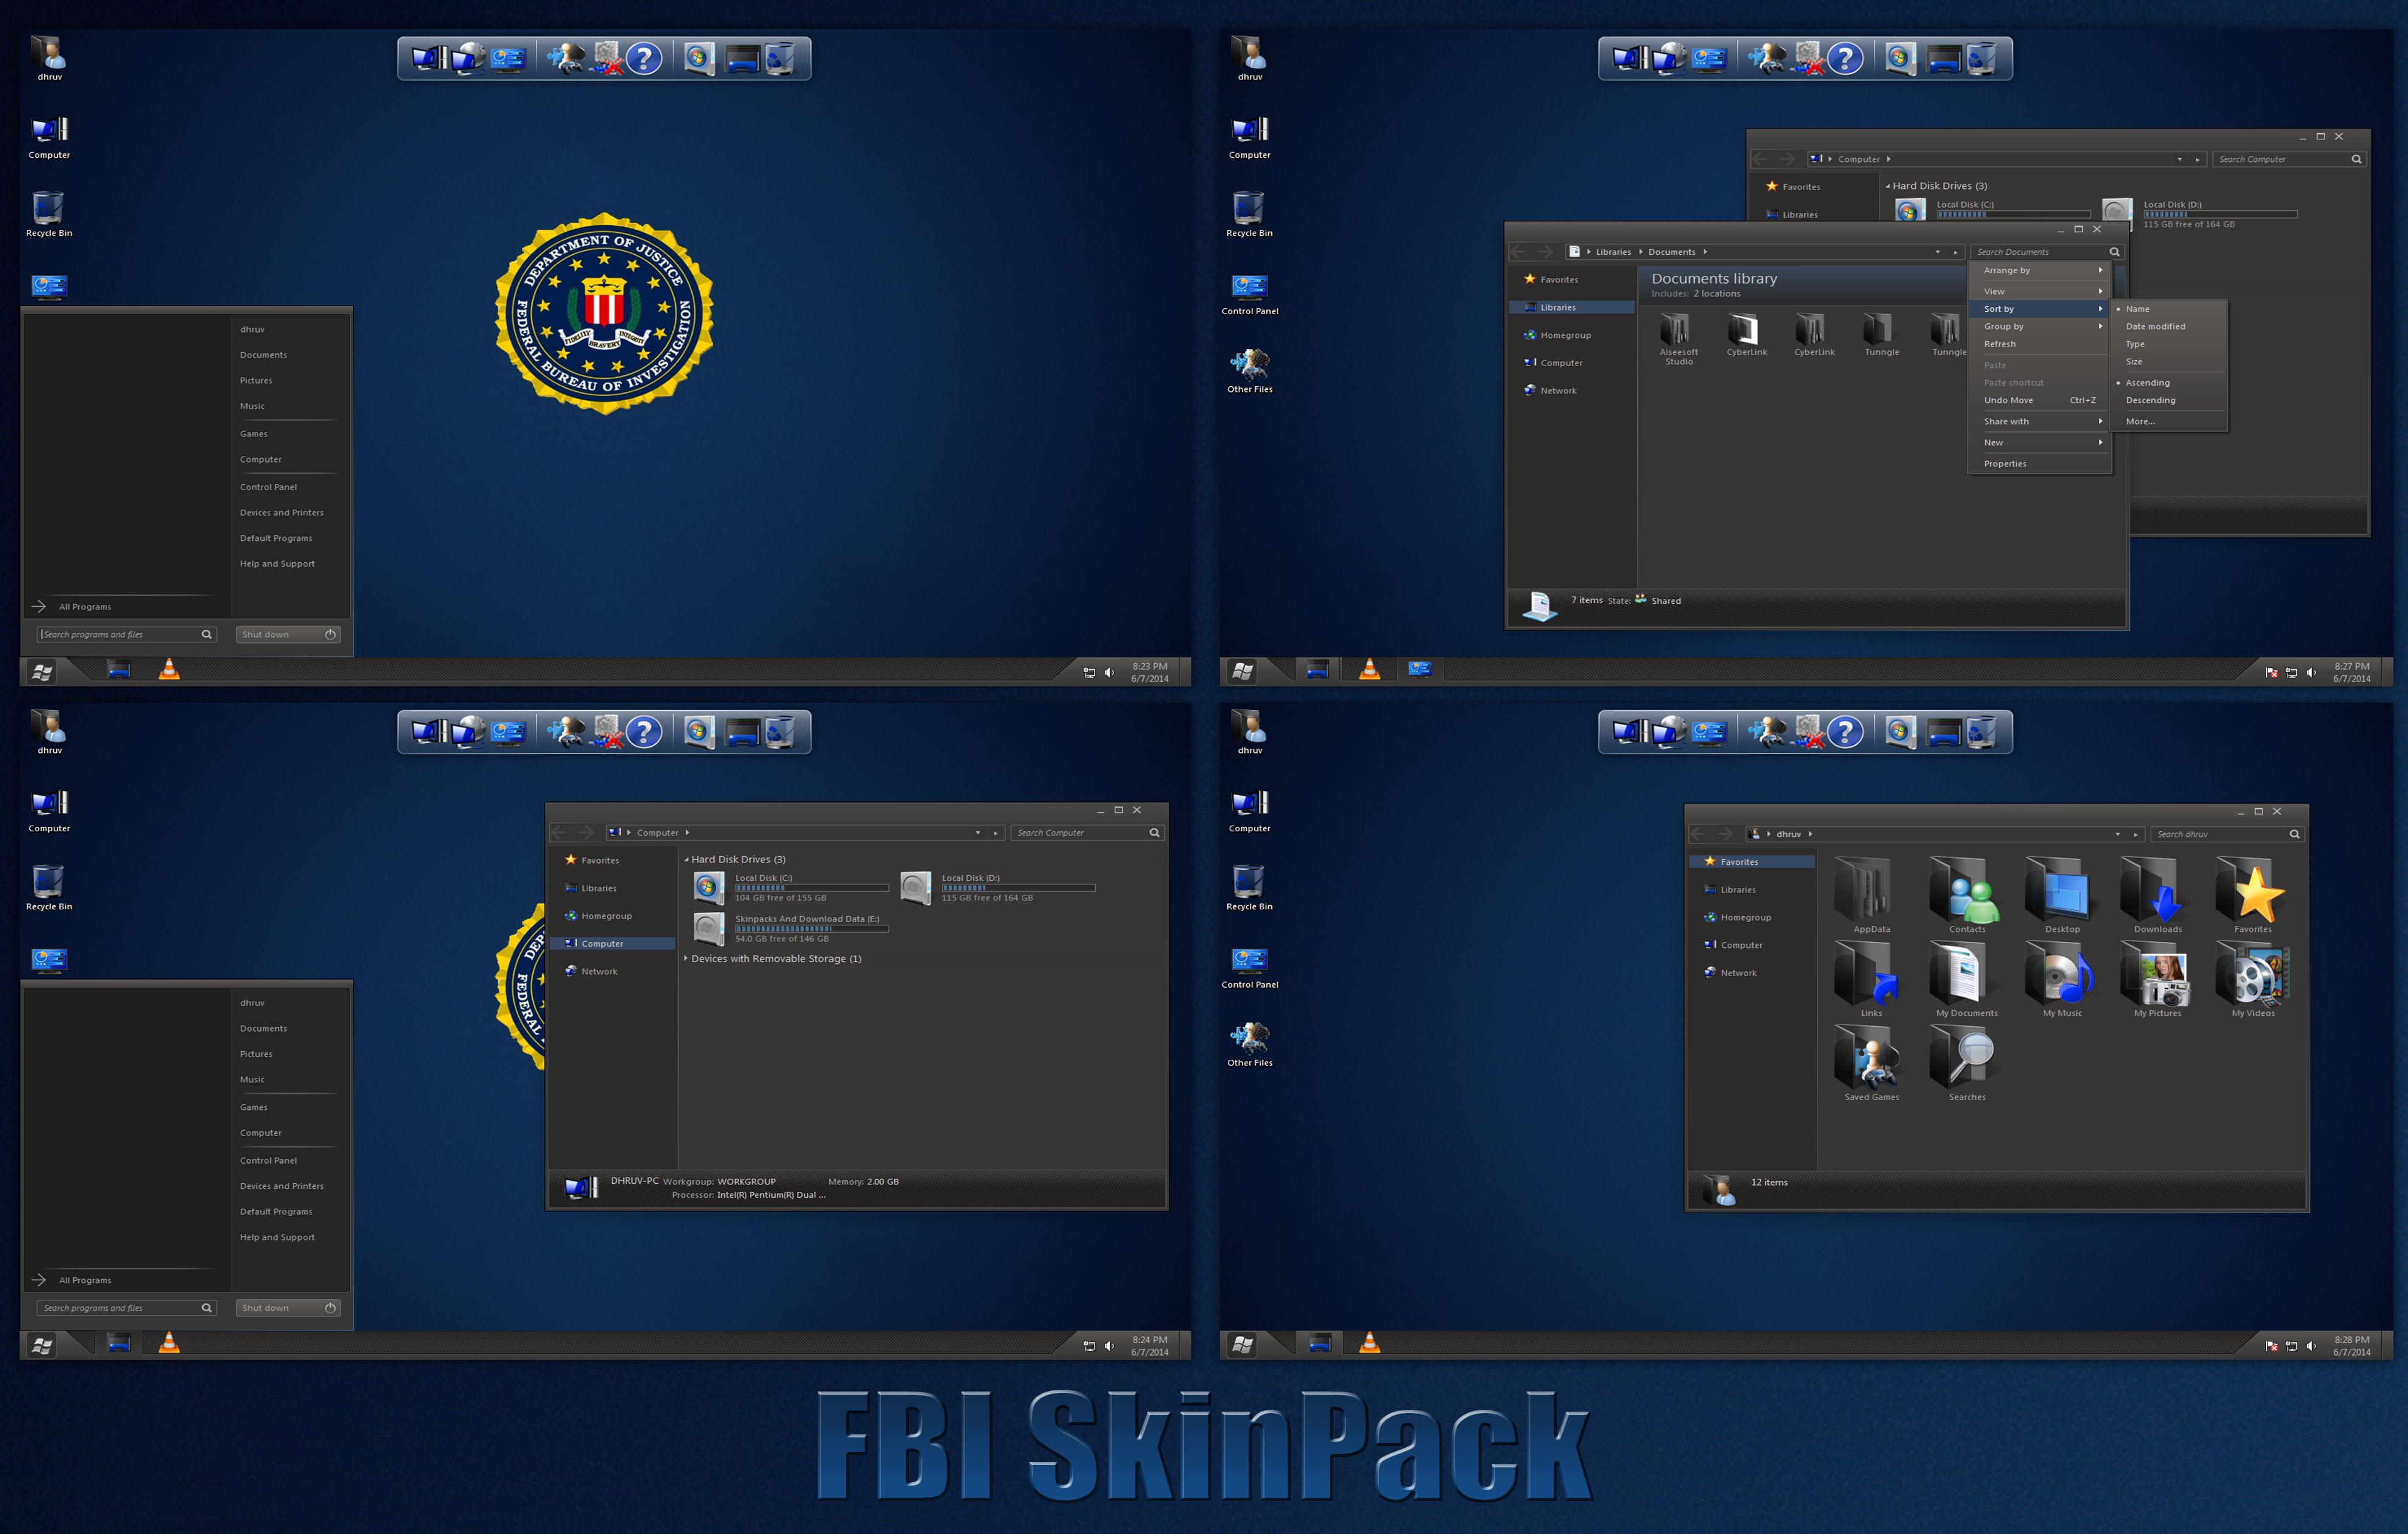 fbi skinpack for windows 788 1